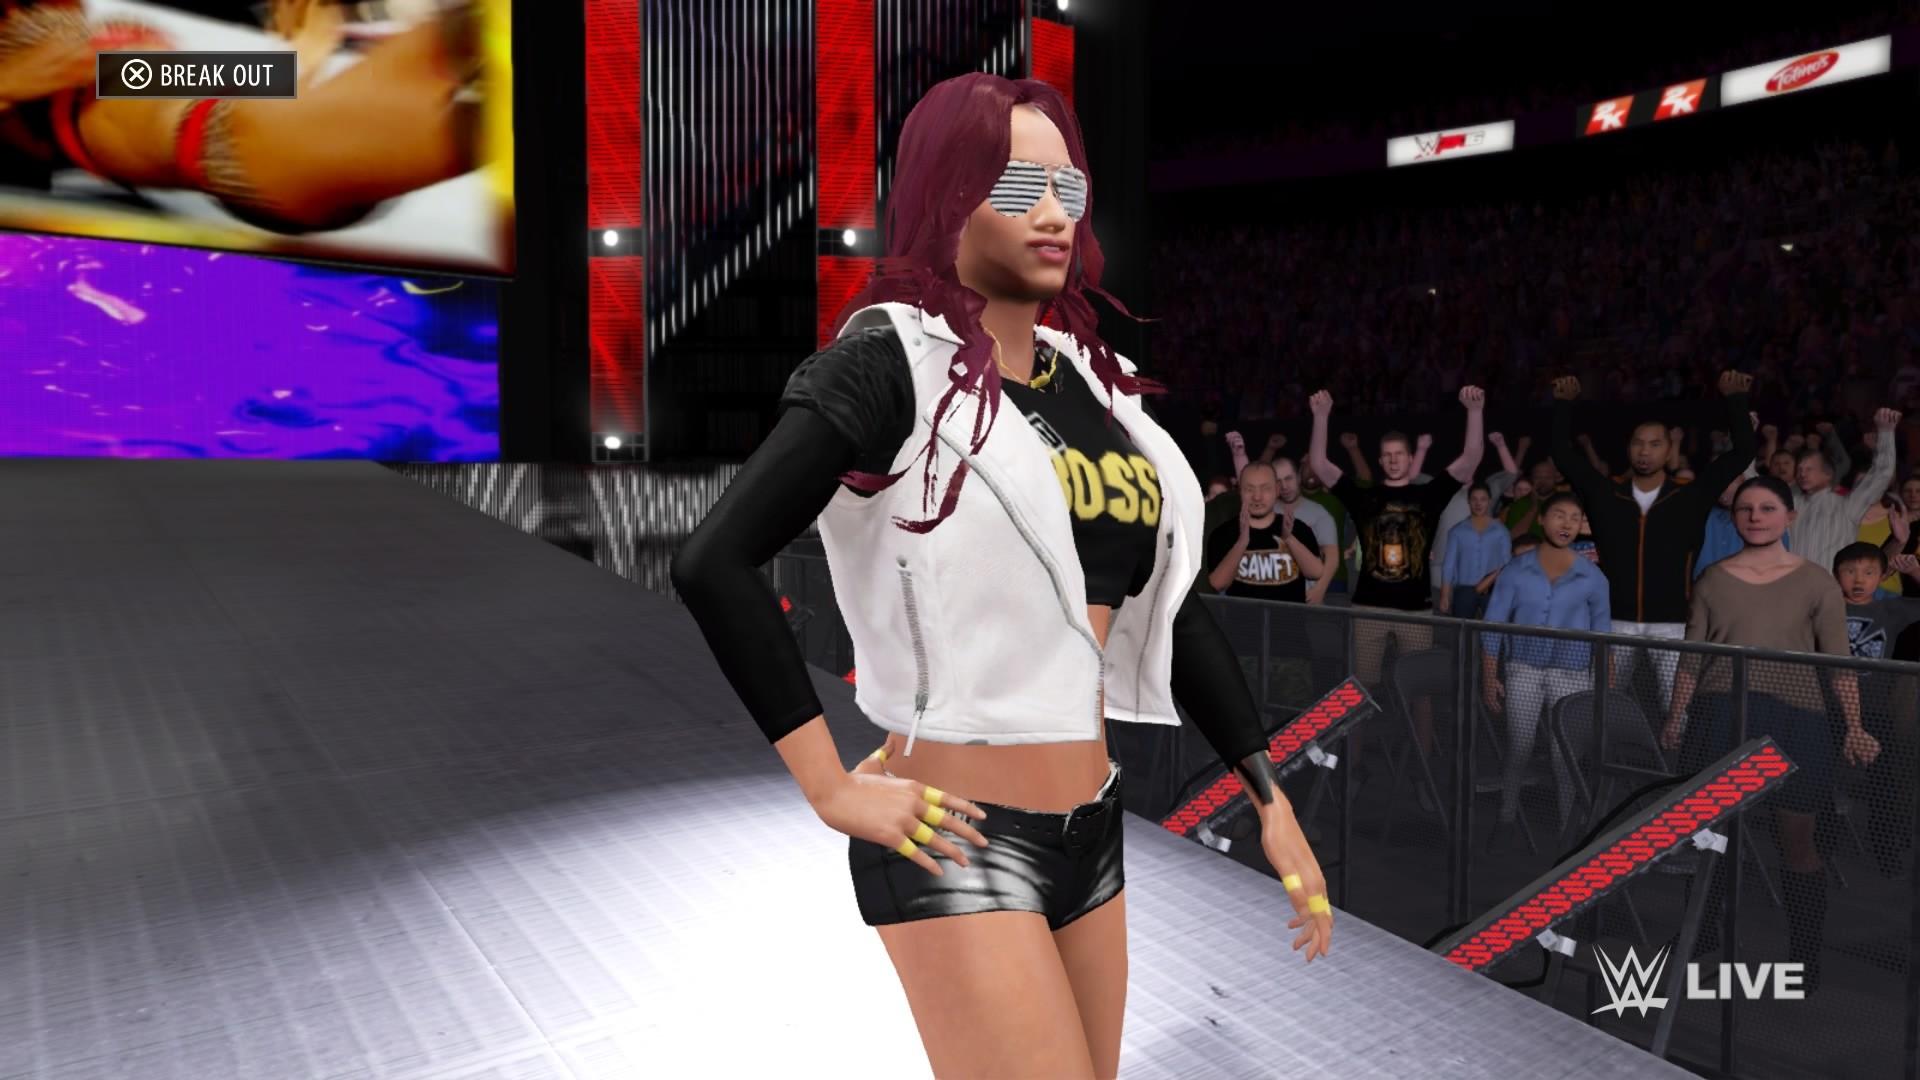 WWE 2K16's best fan creations: Get Sasha, Becky, Charlotte, Punk and more |  GamesRadar+